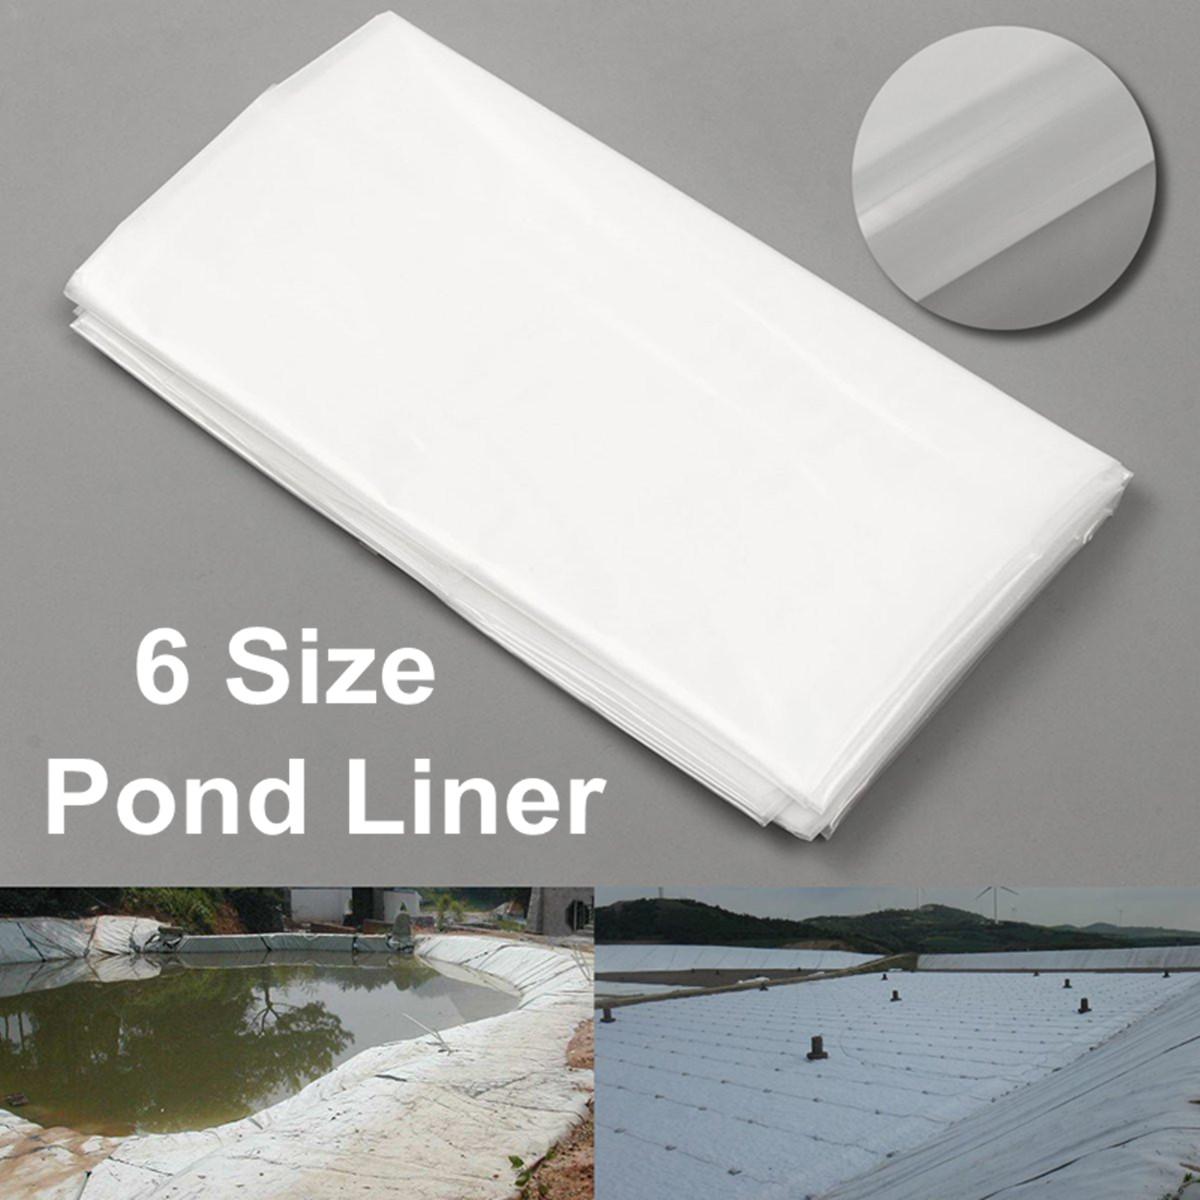 2m×2/3/4/5/6/7m White Fish Pond Liner Fishing Tool Garden Pool HDPE Membrane Reinforced Landscaping